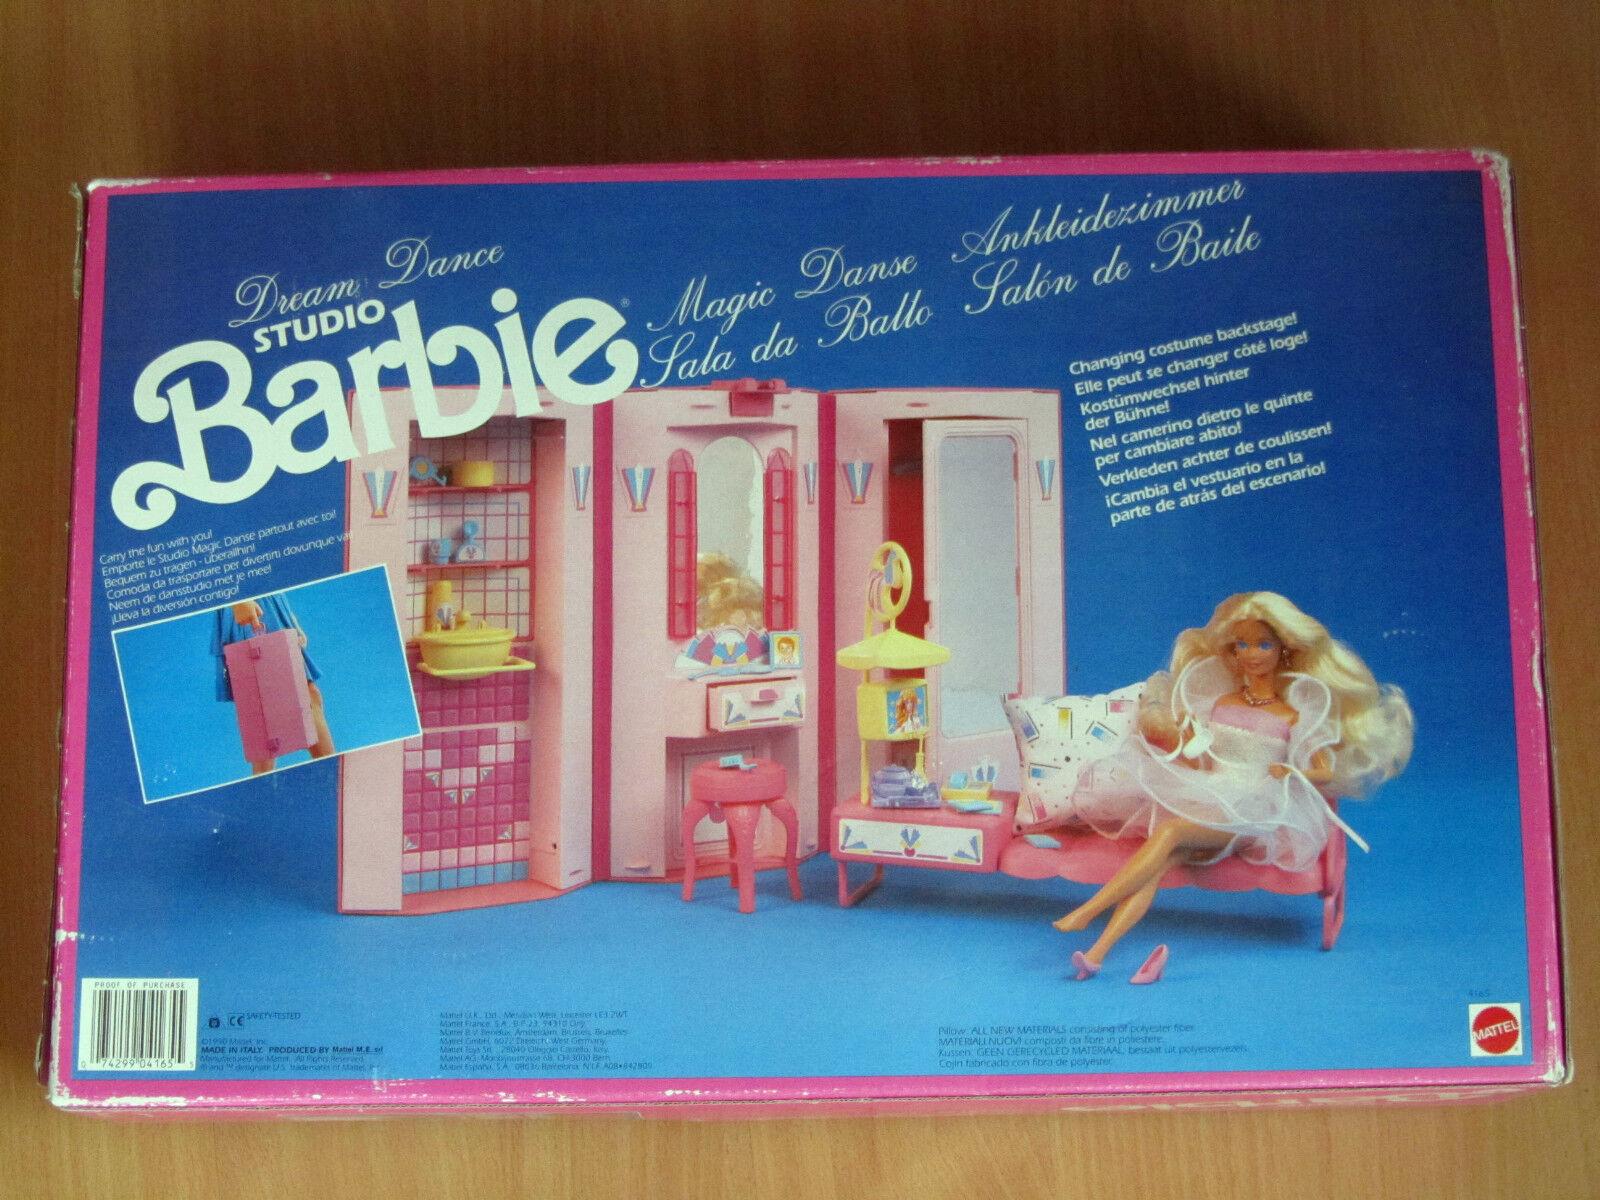 BARBIE STUDIO STUDIO STUDIO SALA DA BtuttiO 1990 RARO DREAM DANCE SALON DE BAILE MATTEL 4165 0e1230